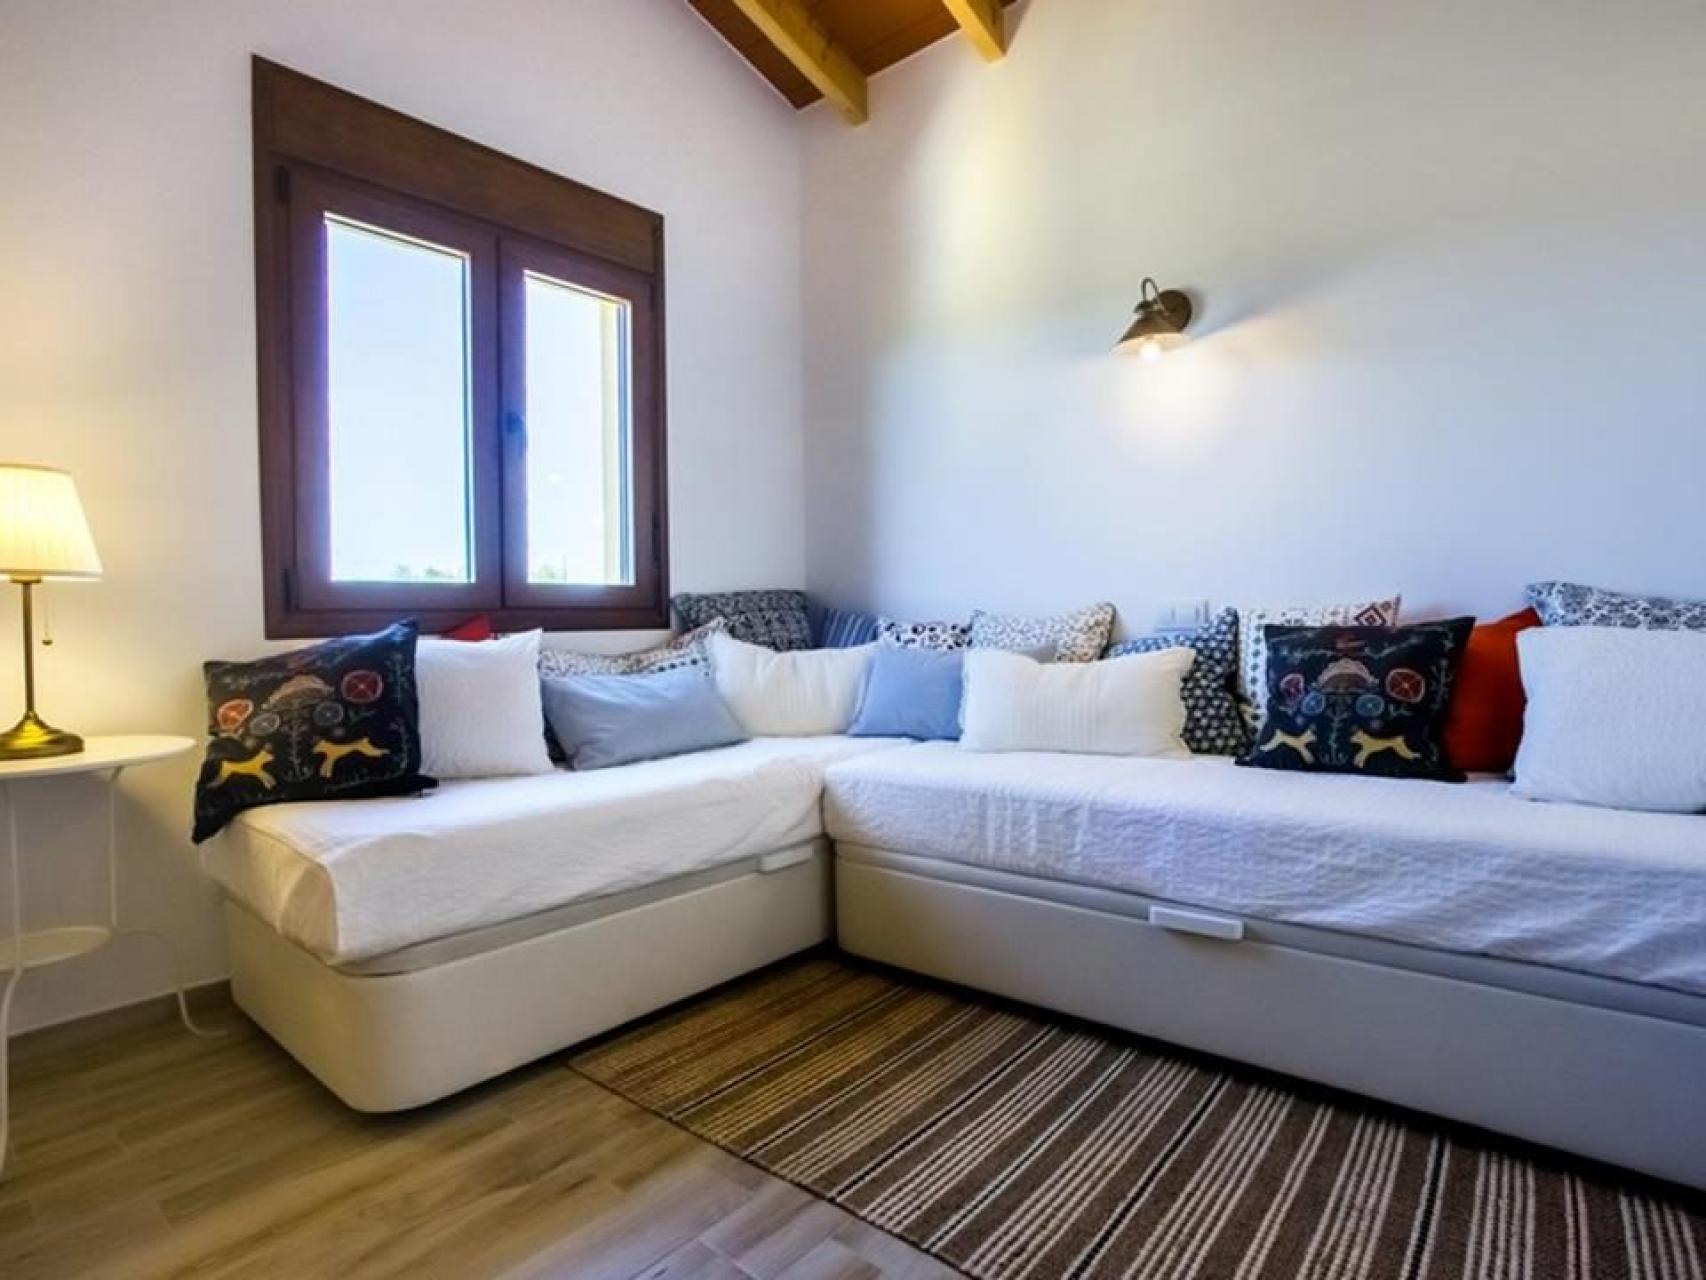 Fotogalería - 4 - Build a villa in Moraira: villas for sale in Moraira